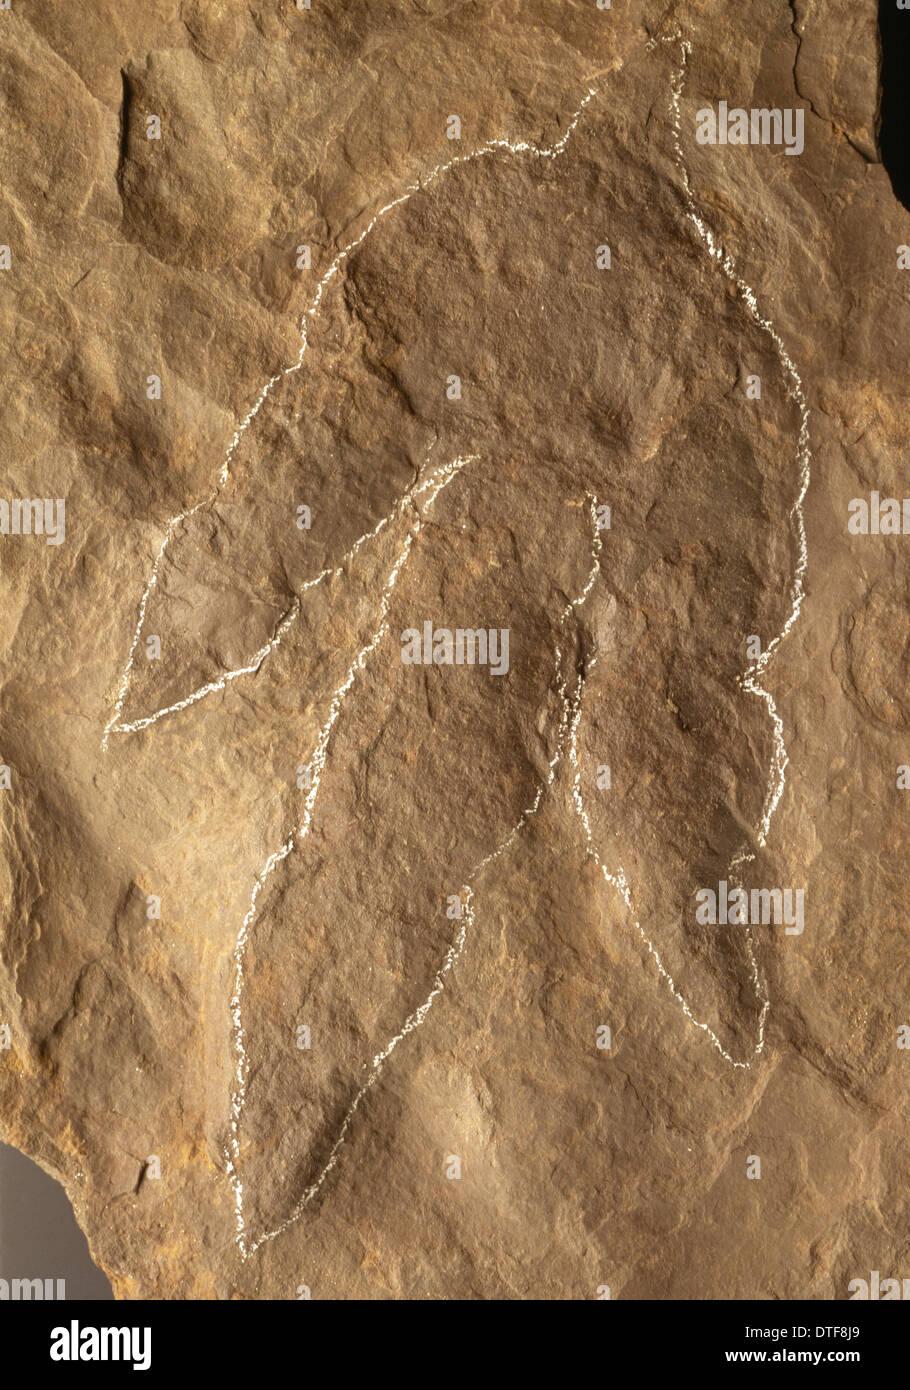 Dinosaur footprint - Stock Image